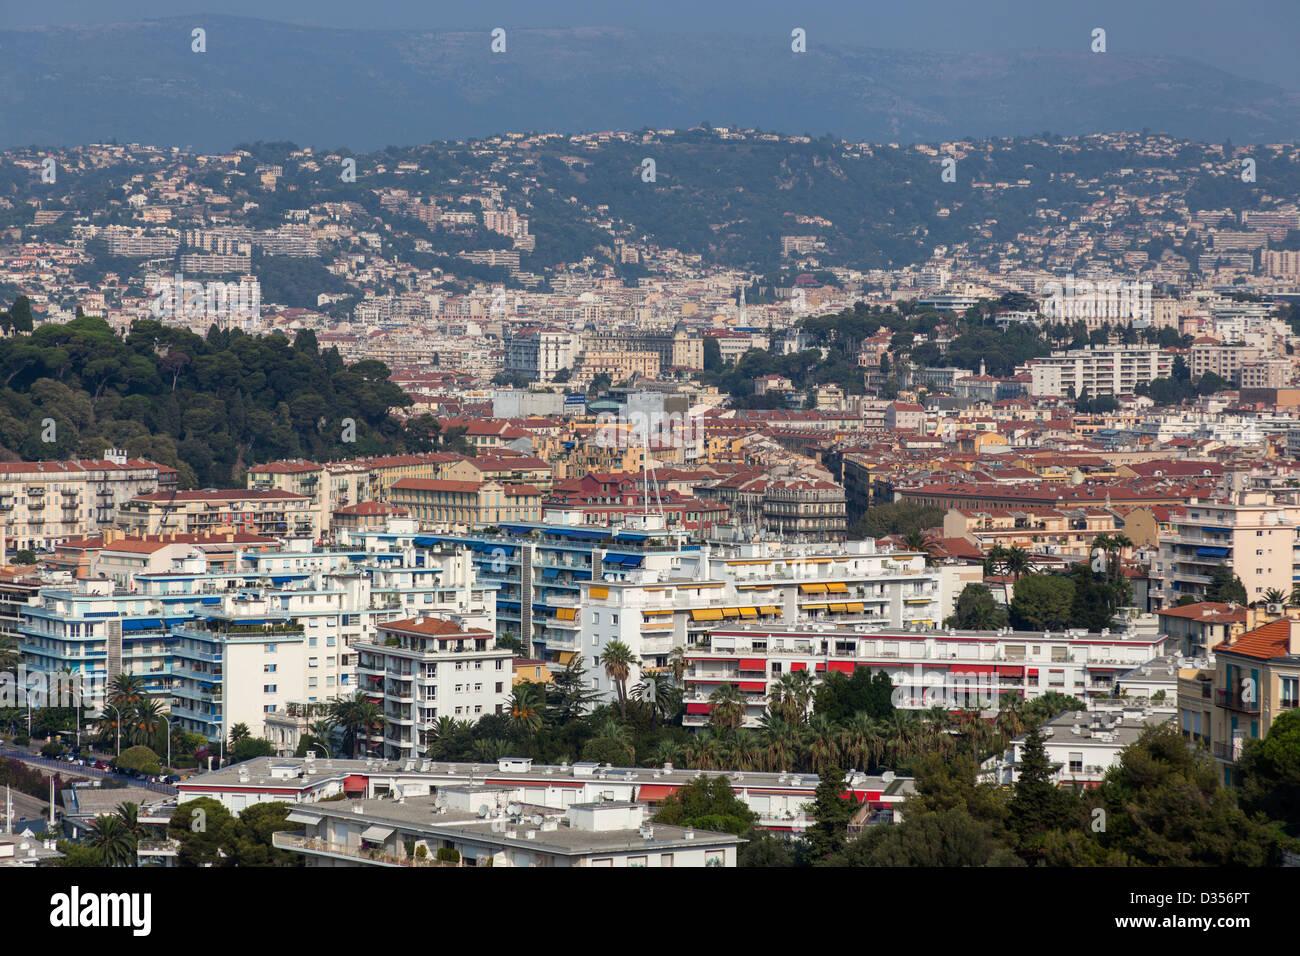 Nizza - Mediterranean City in Southern France - Stock Image